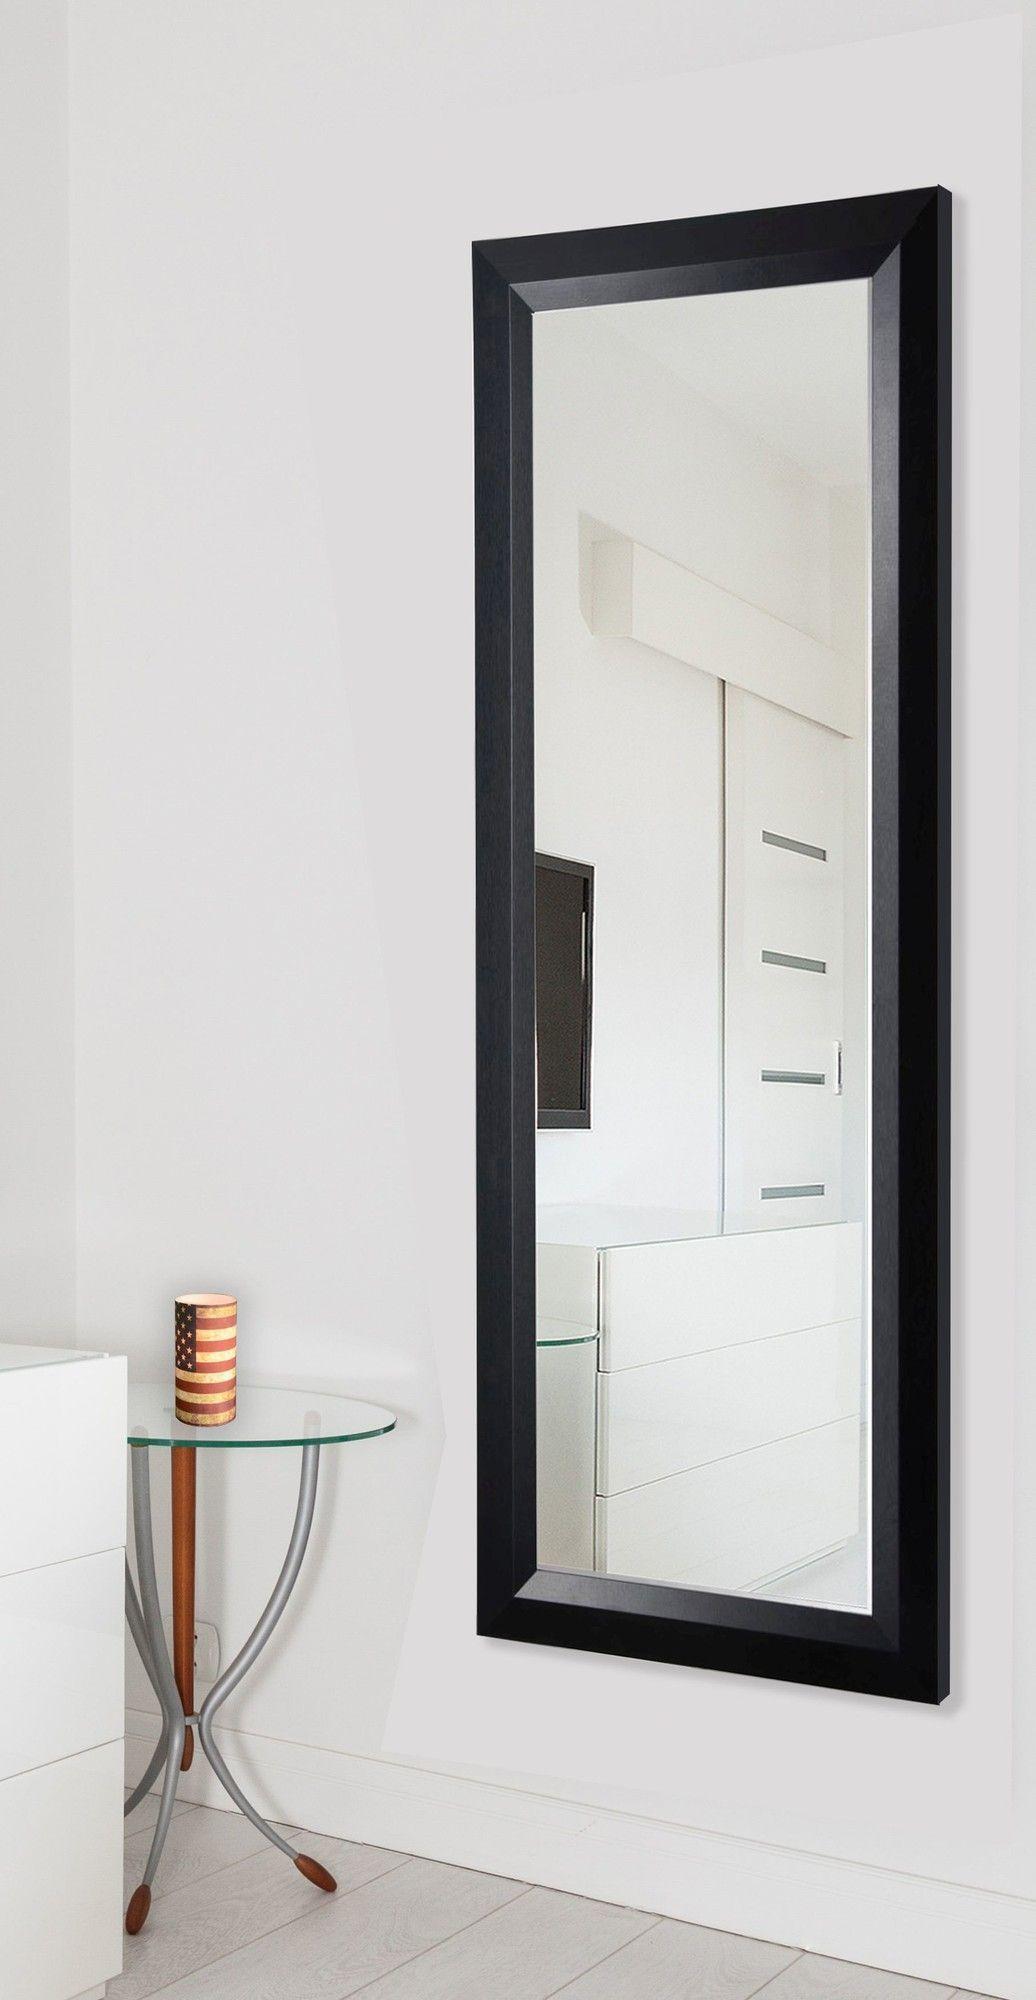 Rayne Mirrors Ava Popular Black Slant Full Length Body Mirror Full Body Mirror Body Mirror Full Length Mirror In Bedroom